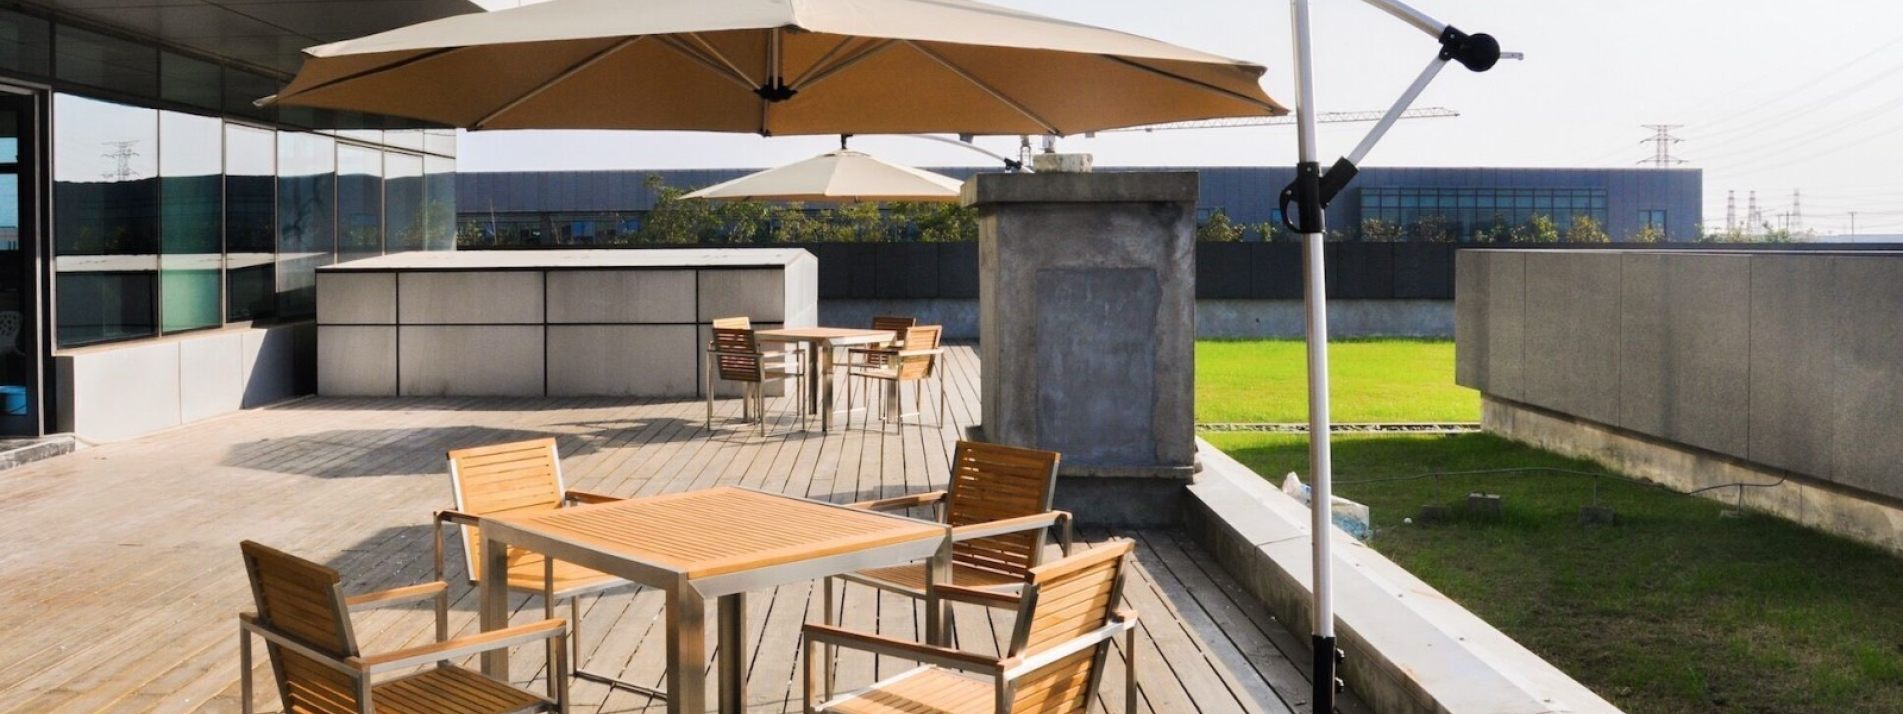 Outdoor patio dining set